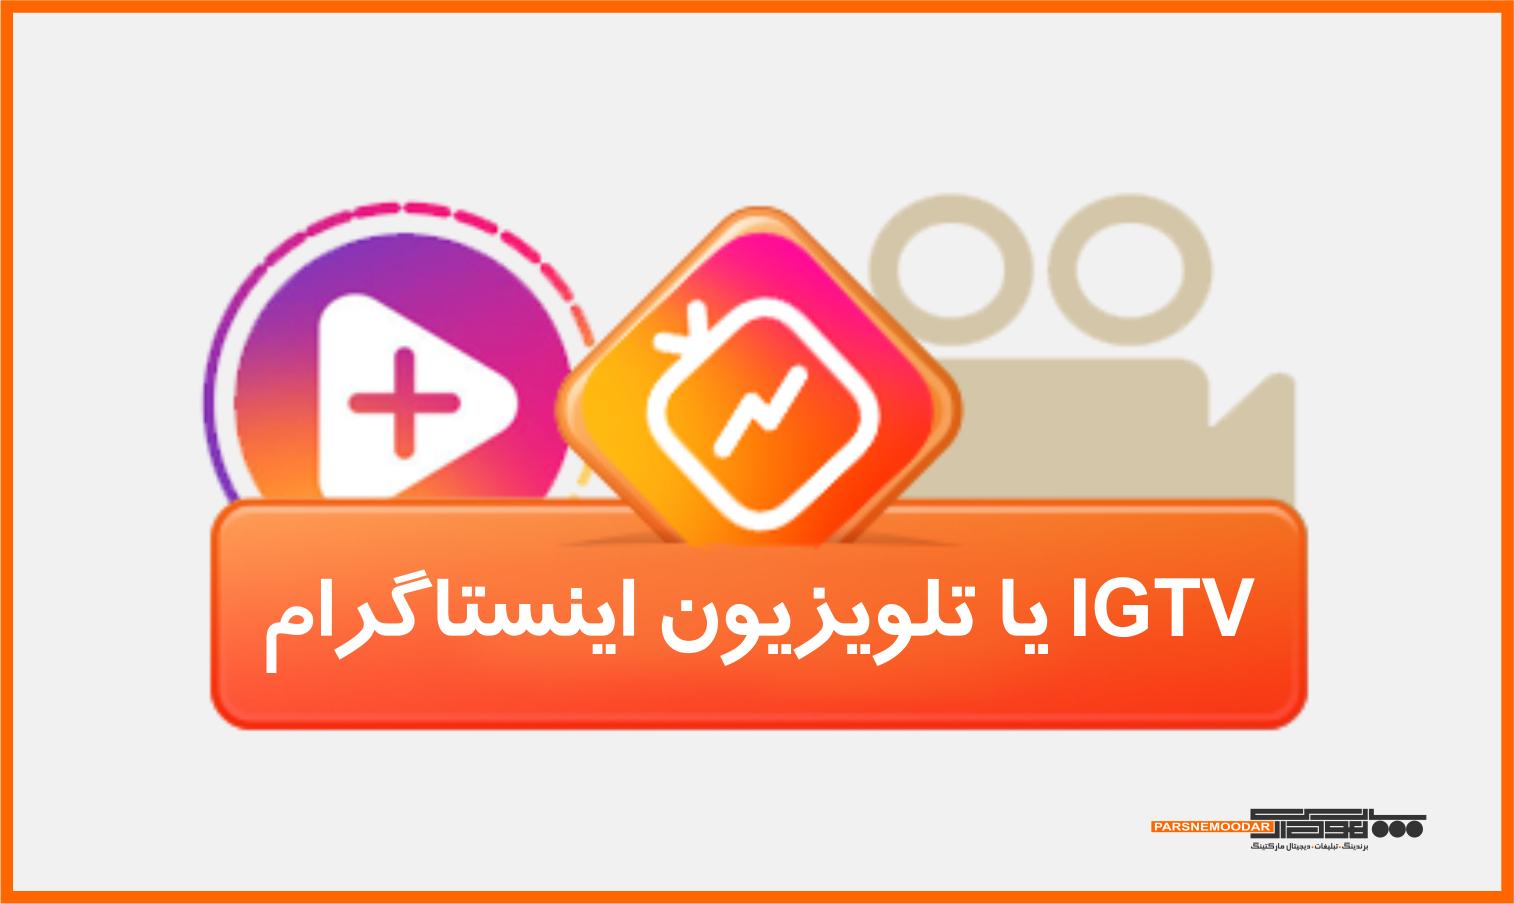 تلویزیون اینستاگرام یا IGTV